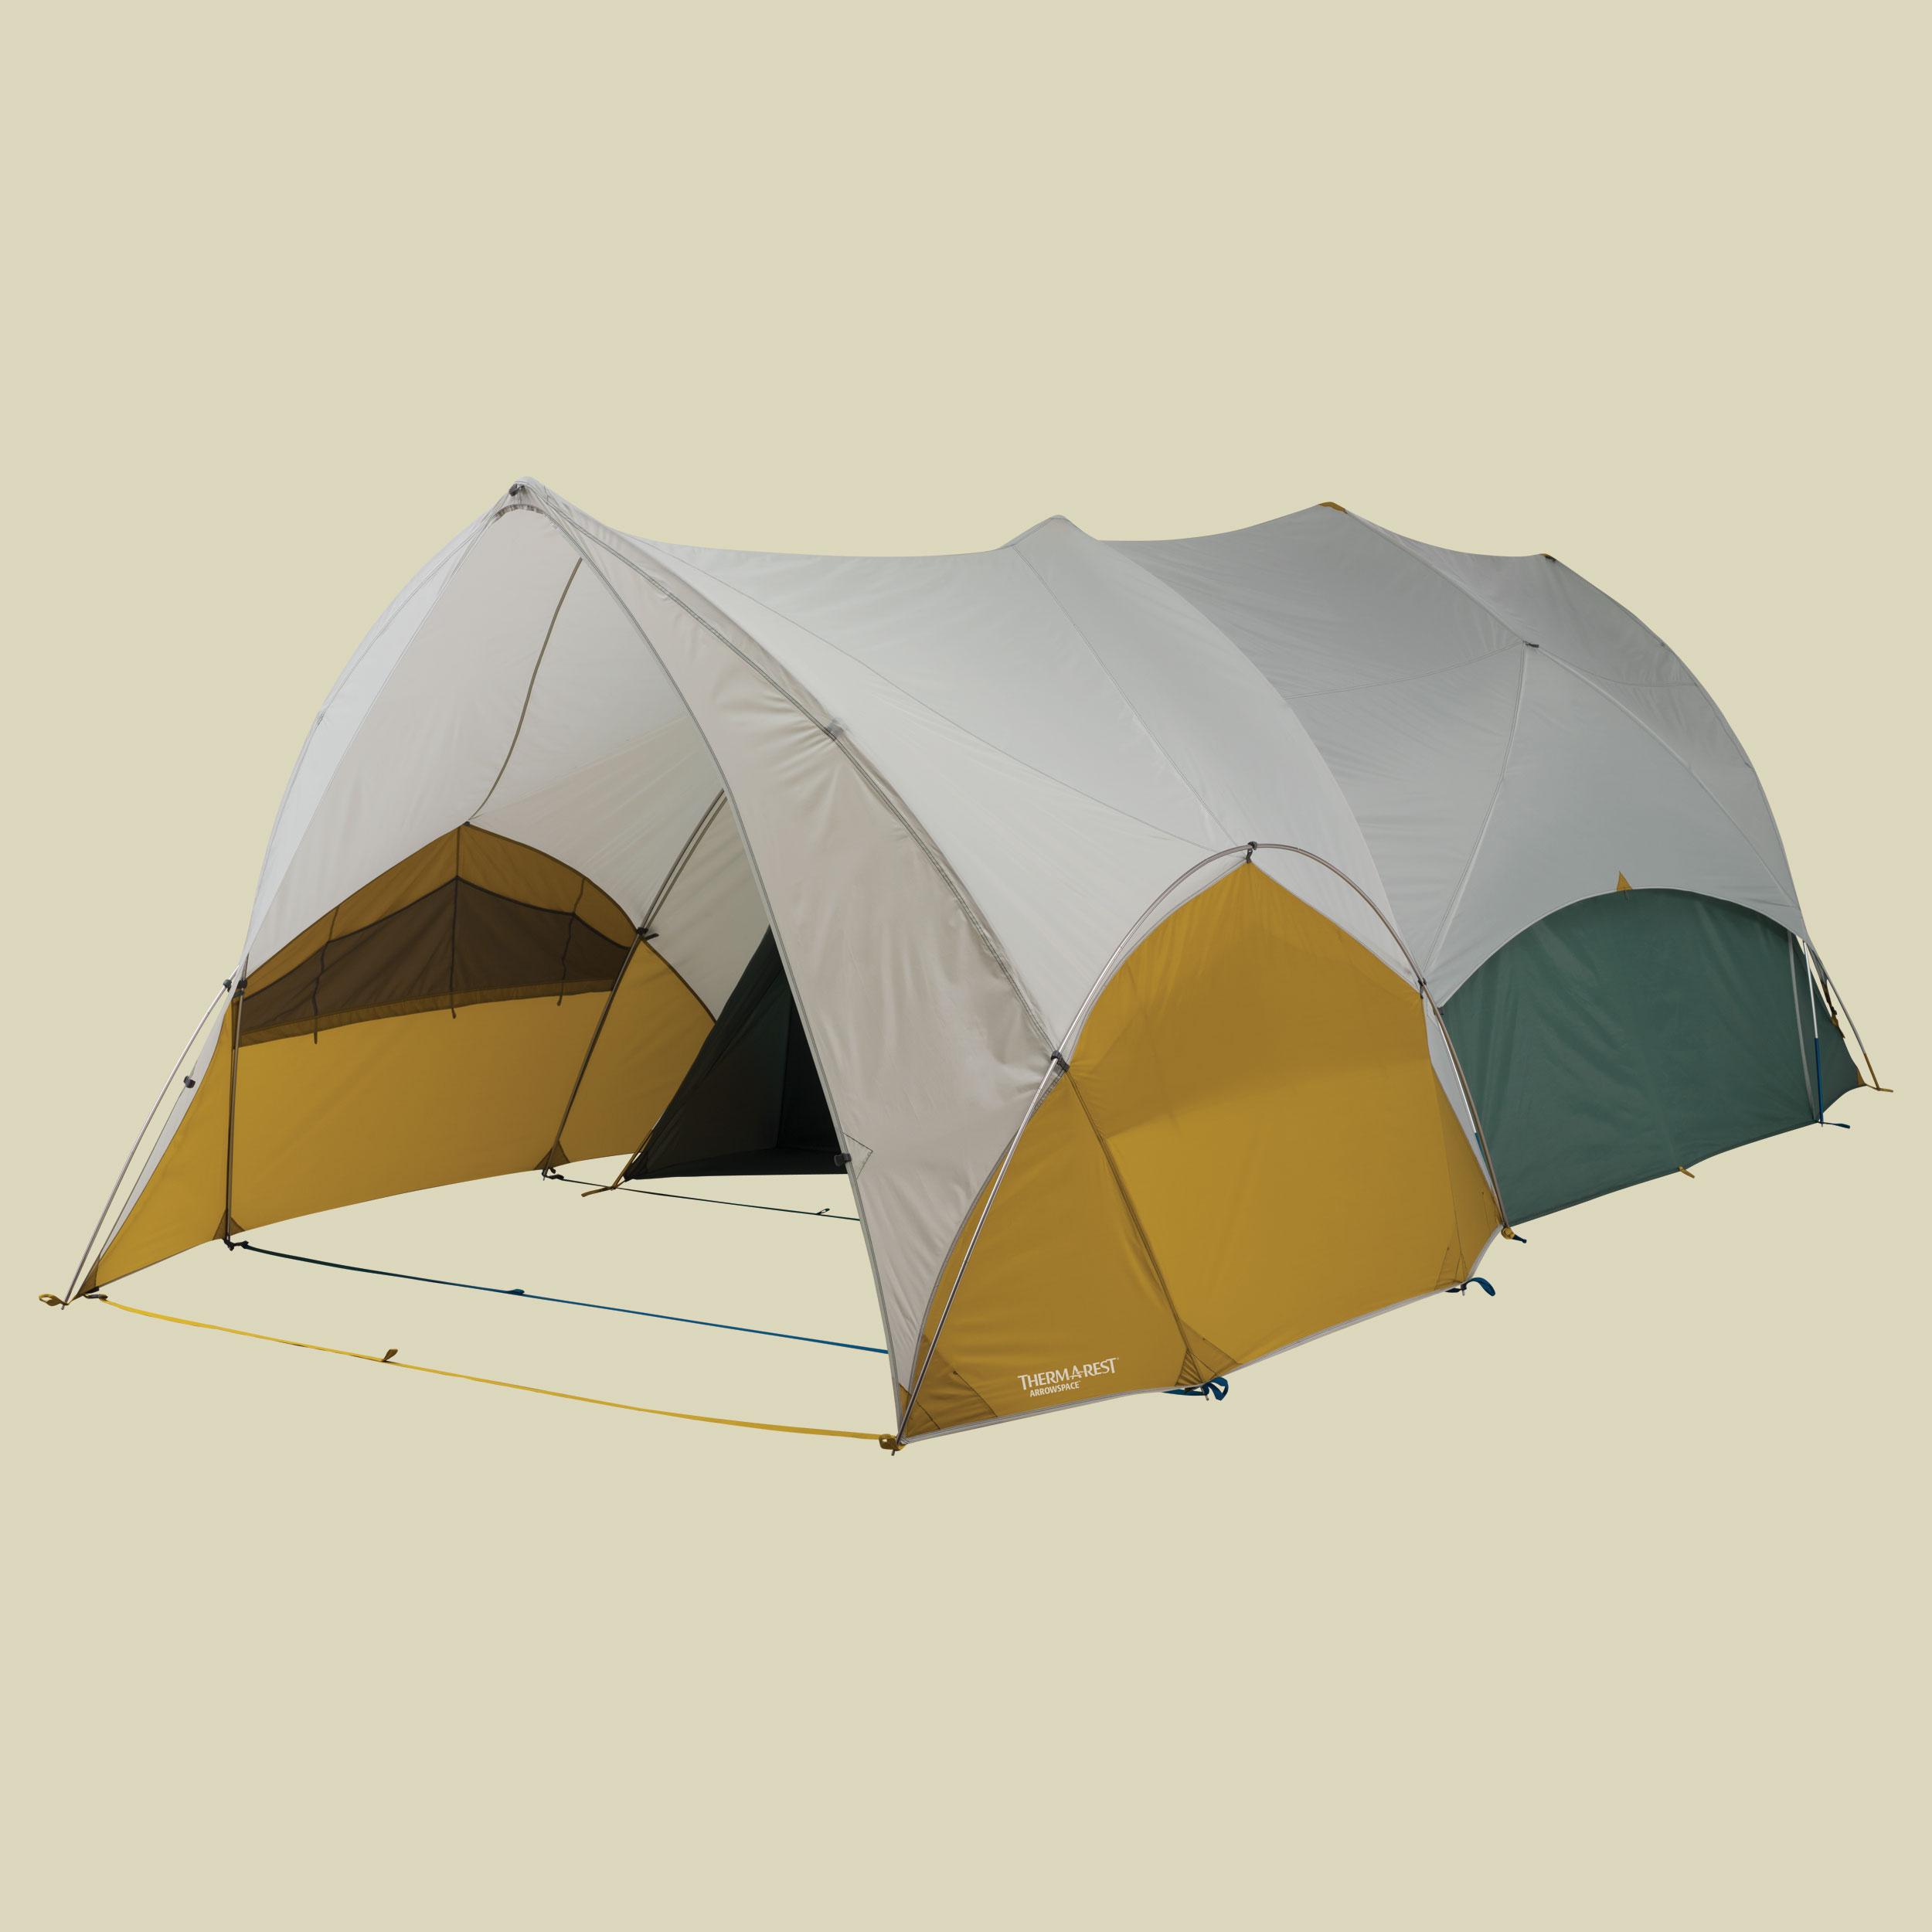 Therm-A-Rest Arrowspace Shelter offenes Zelt, Vorzelt, freistehend